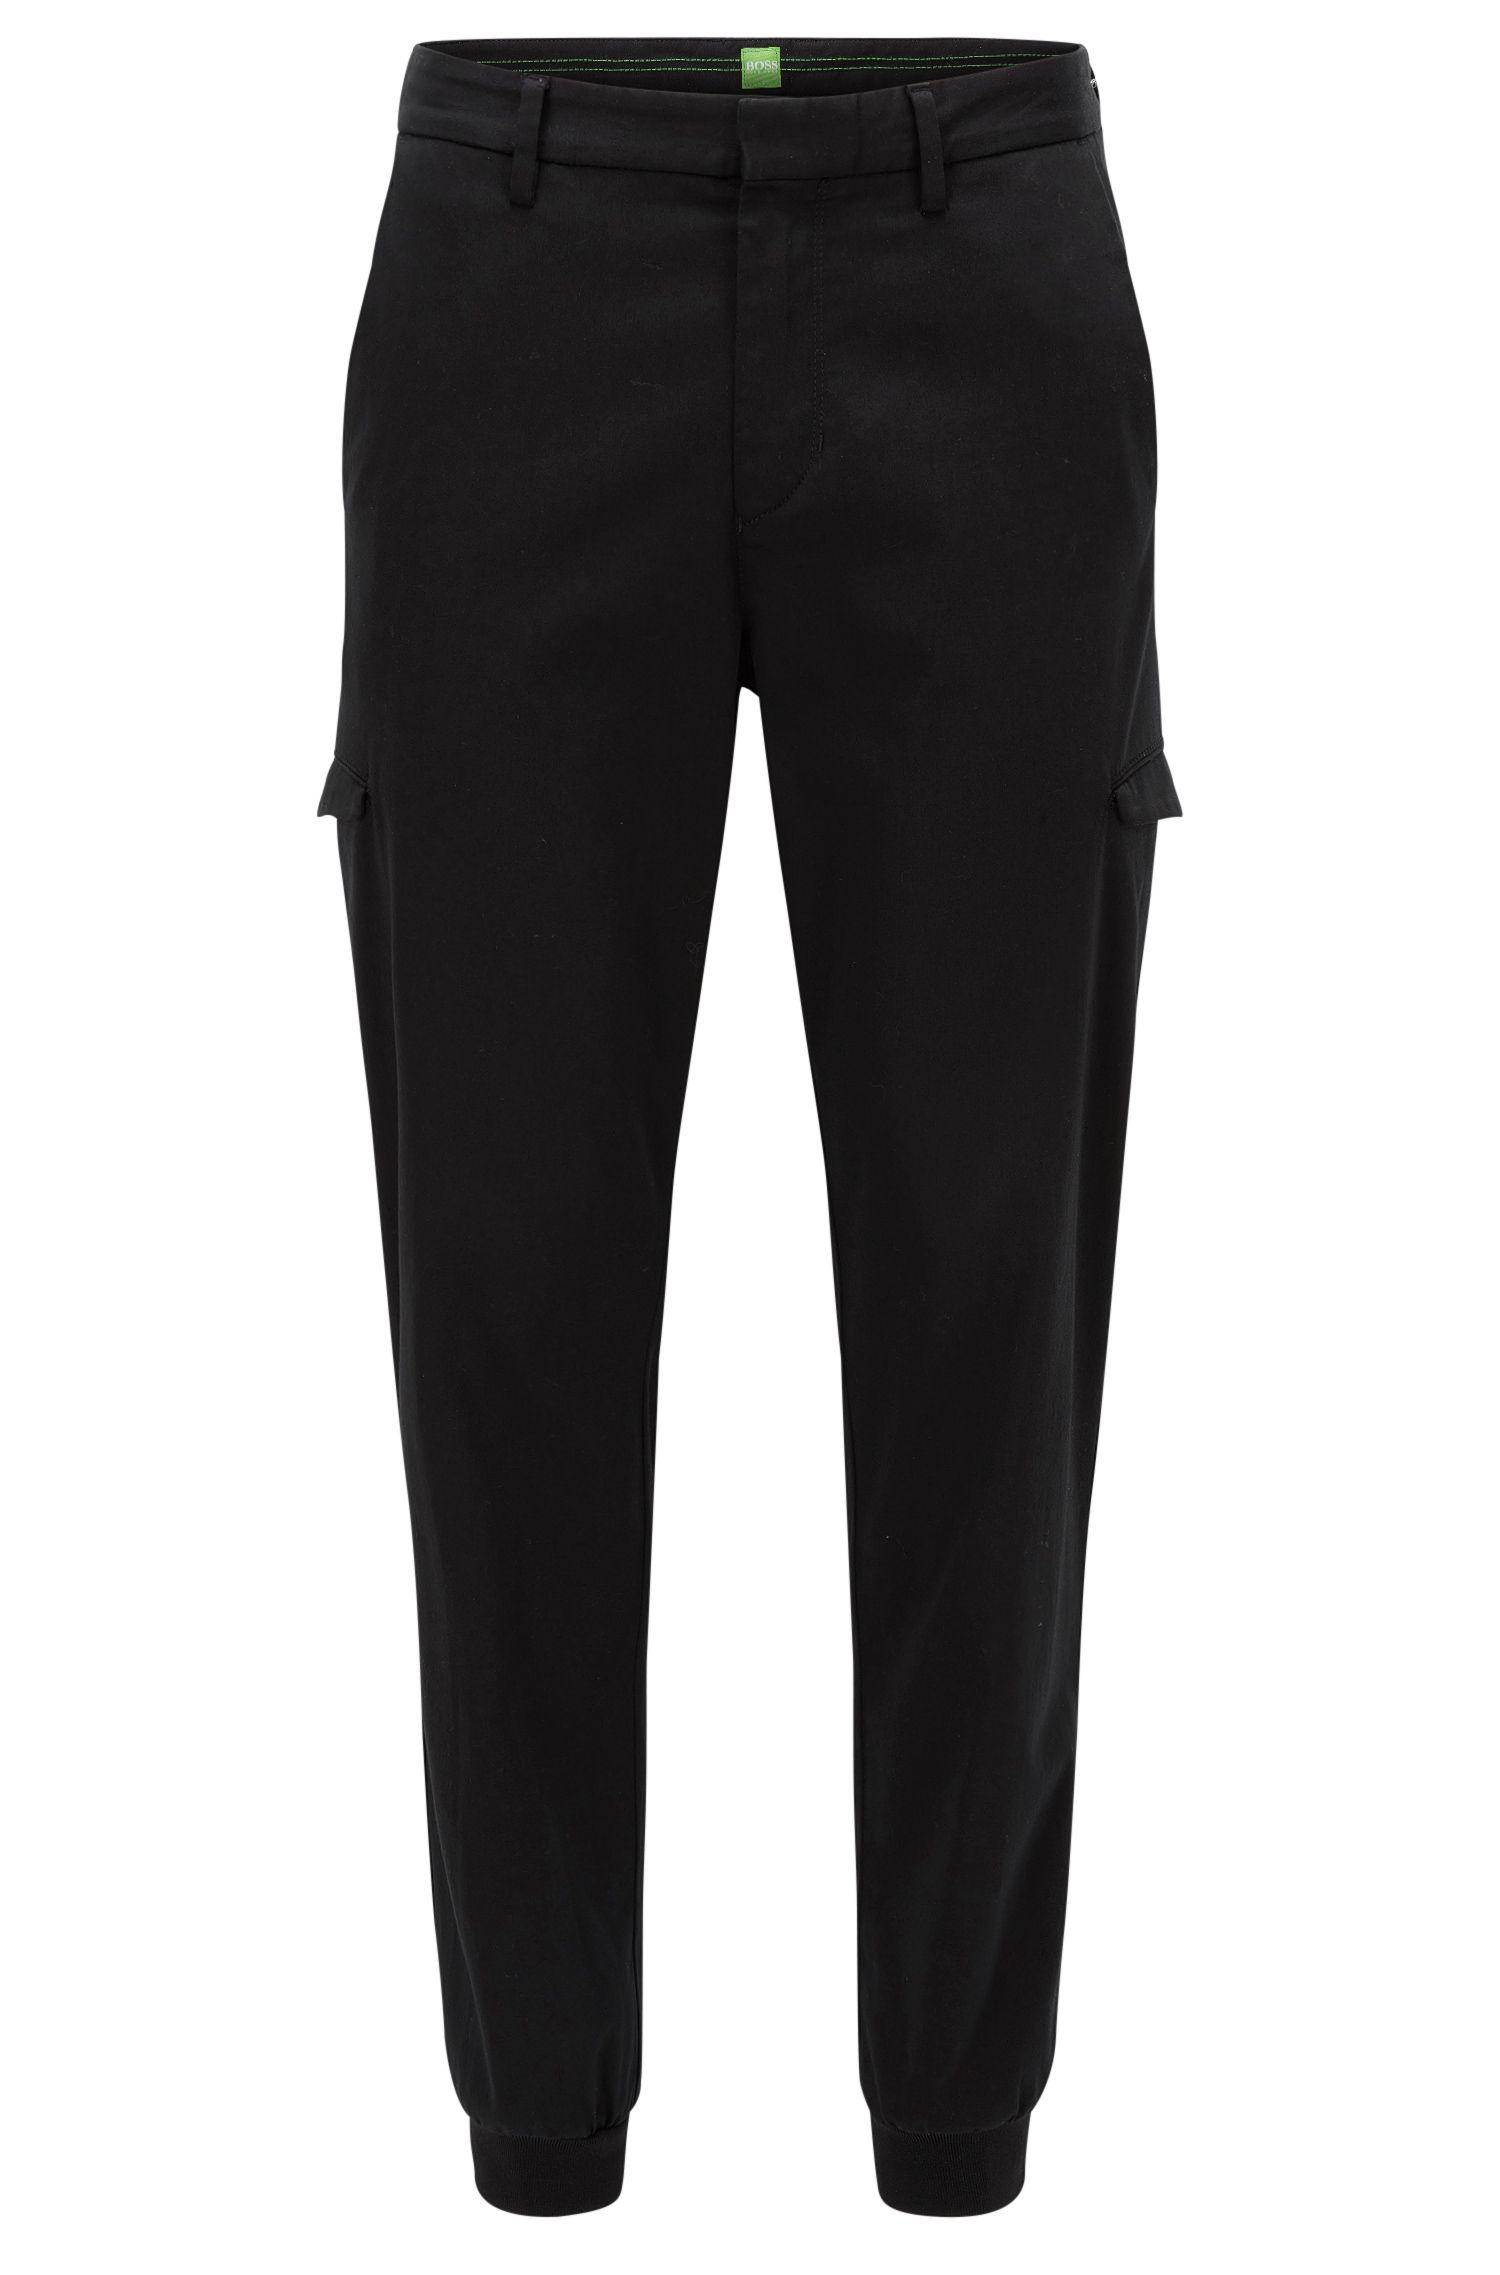 Pantalón cargo slim fit en mezcla de algodón